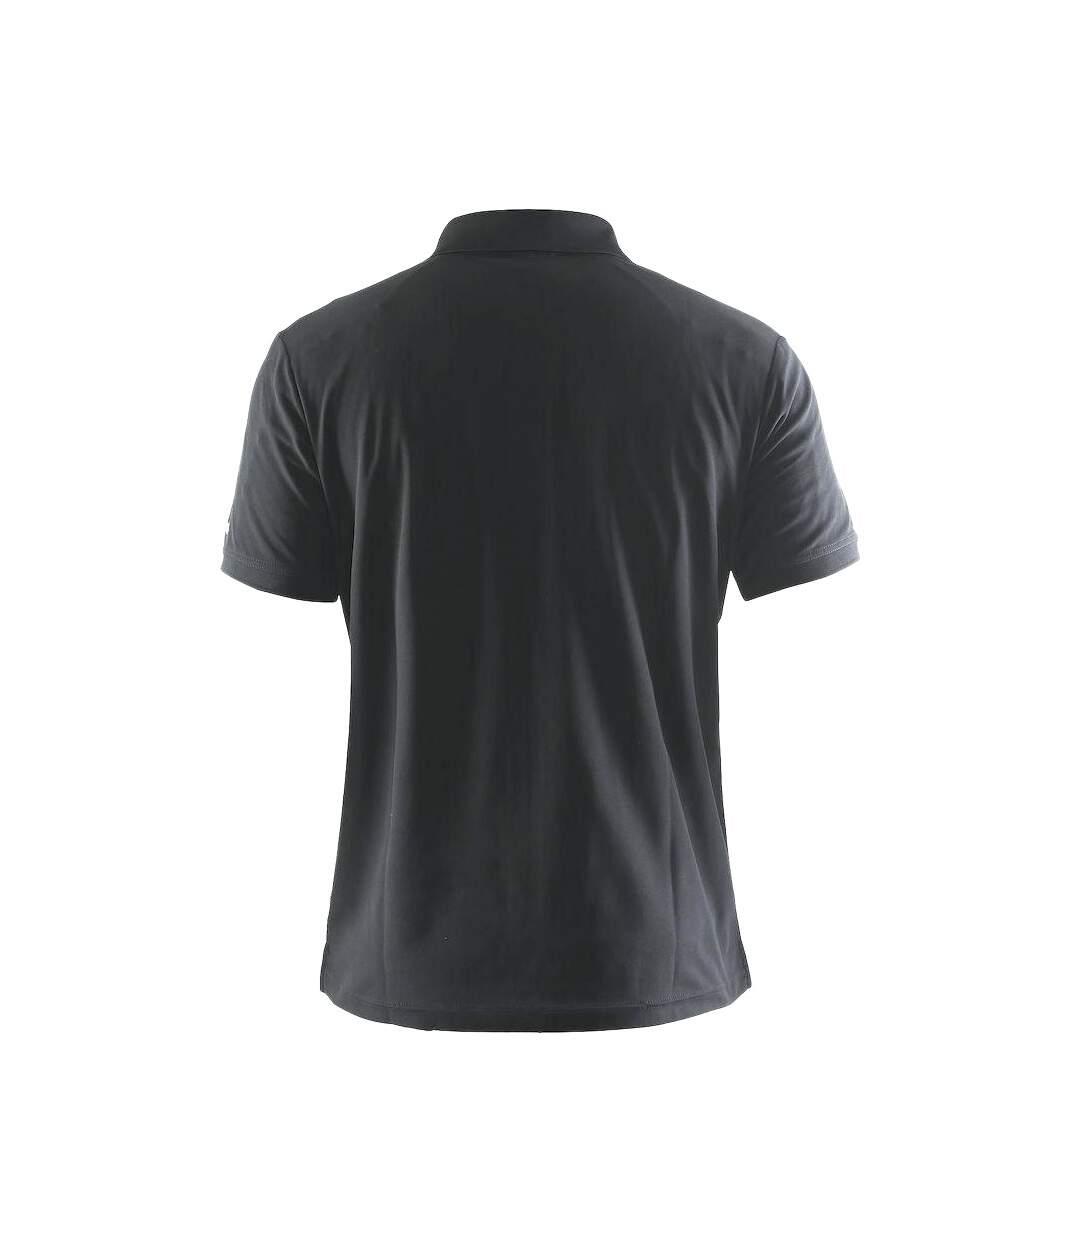 Craft Mens Classic Pique Short Sleeve Polo Shirt (Navy) - UTRW5551